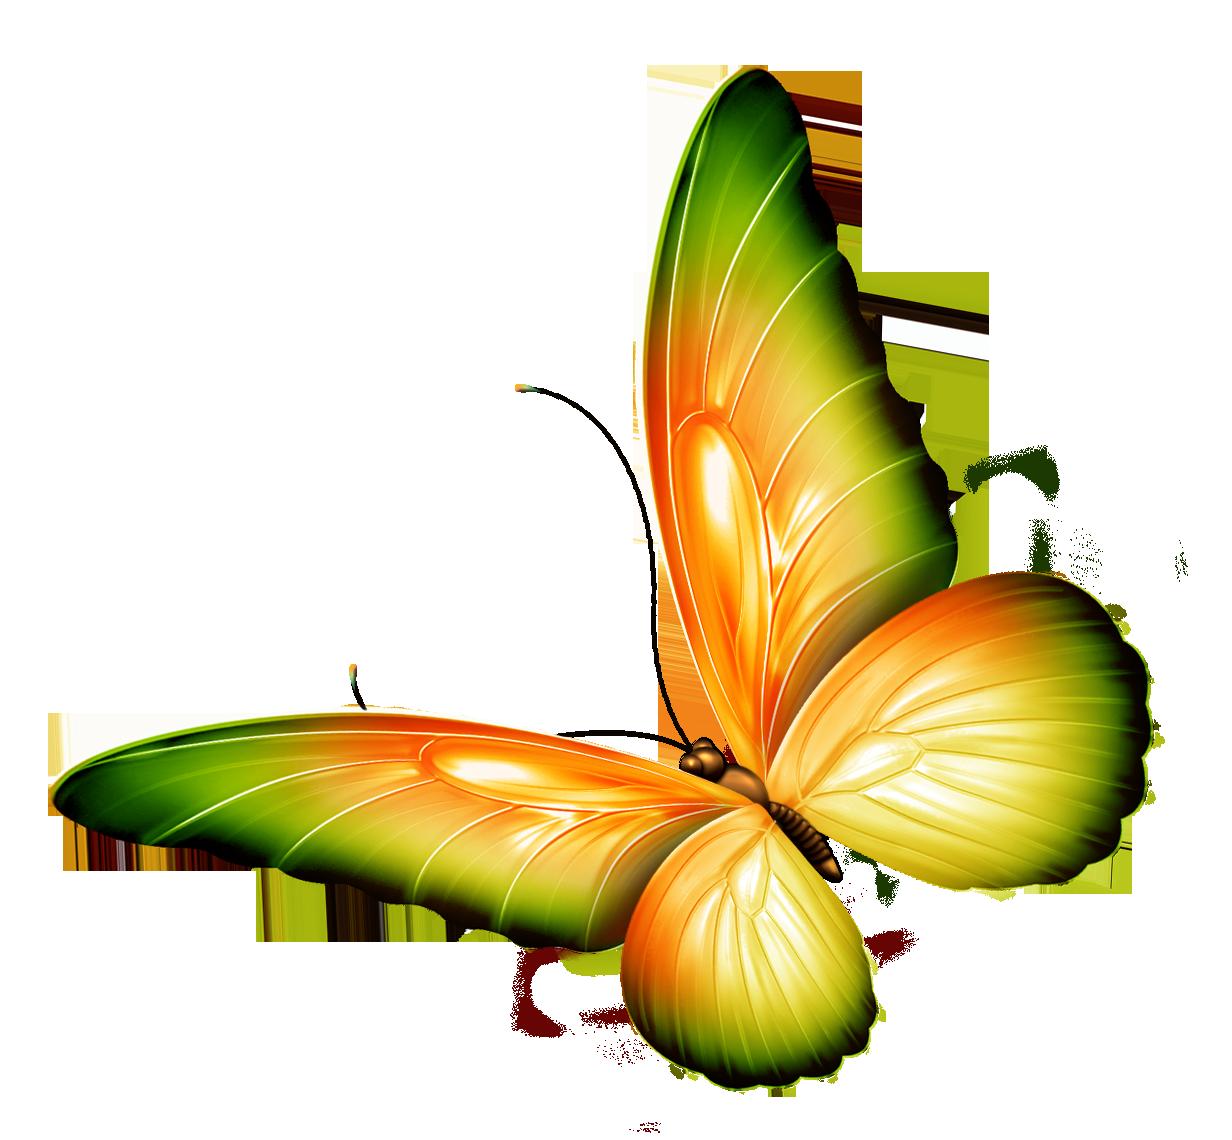 1232x1140 Png Hd Of Butterflies And Flowers Transparent Hd Of Butterflies